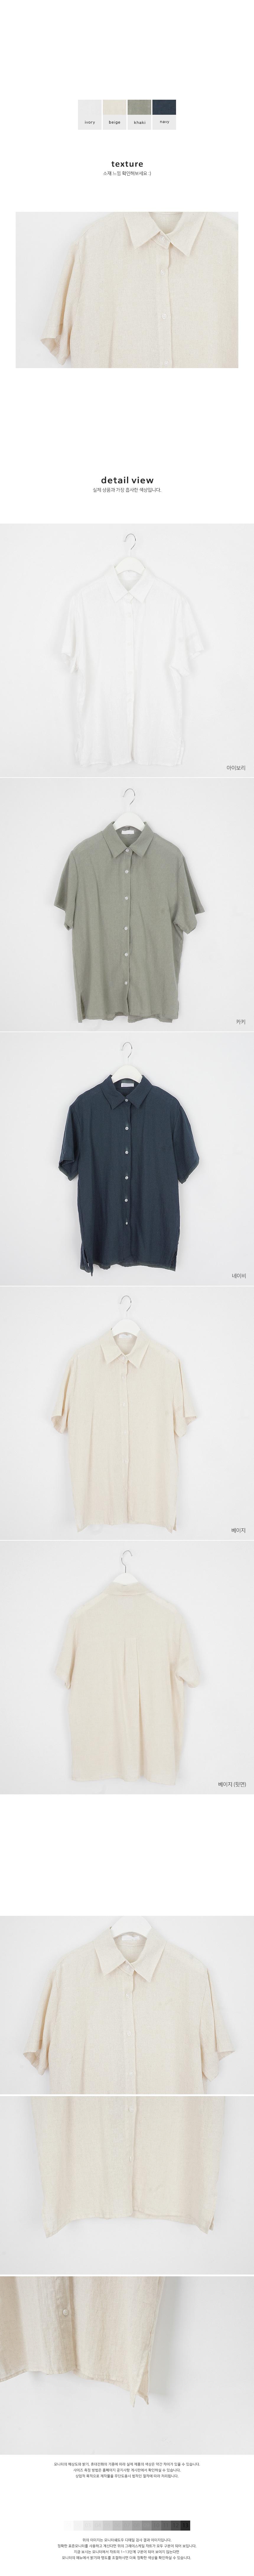 Day short sleeve shirt